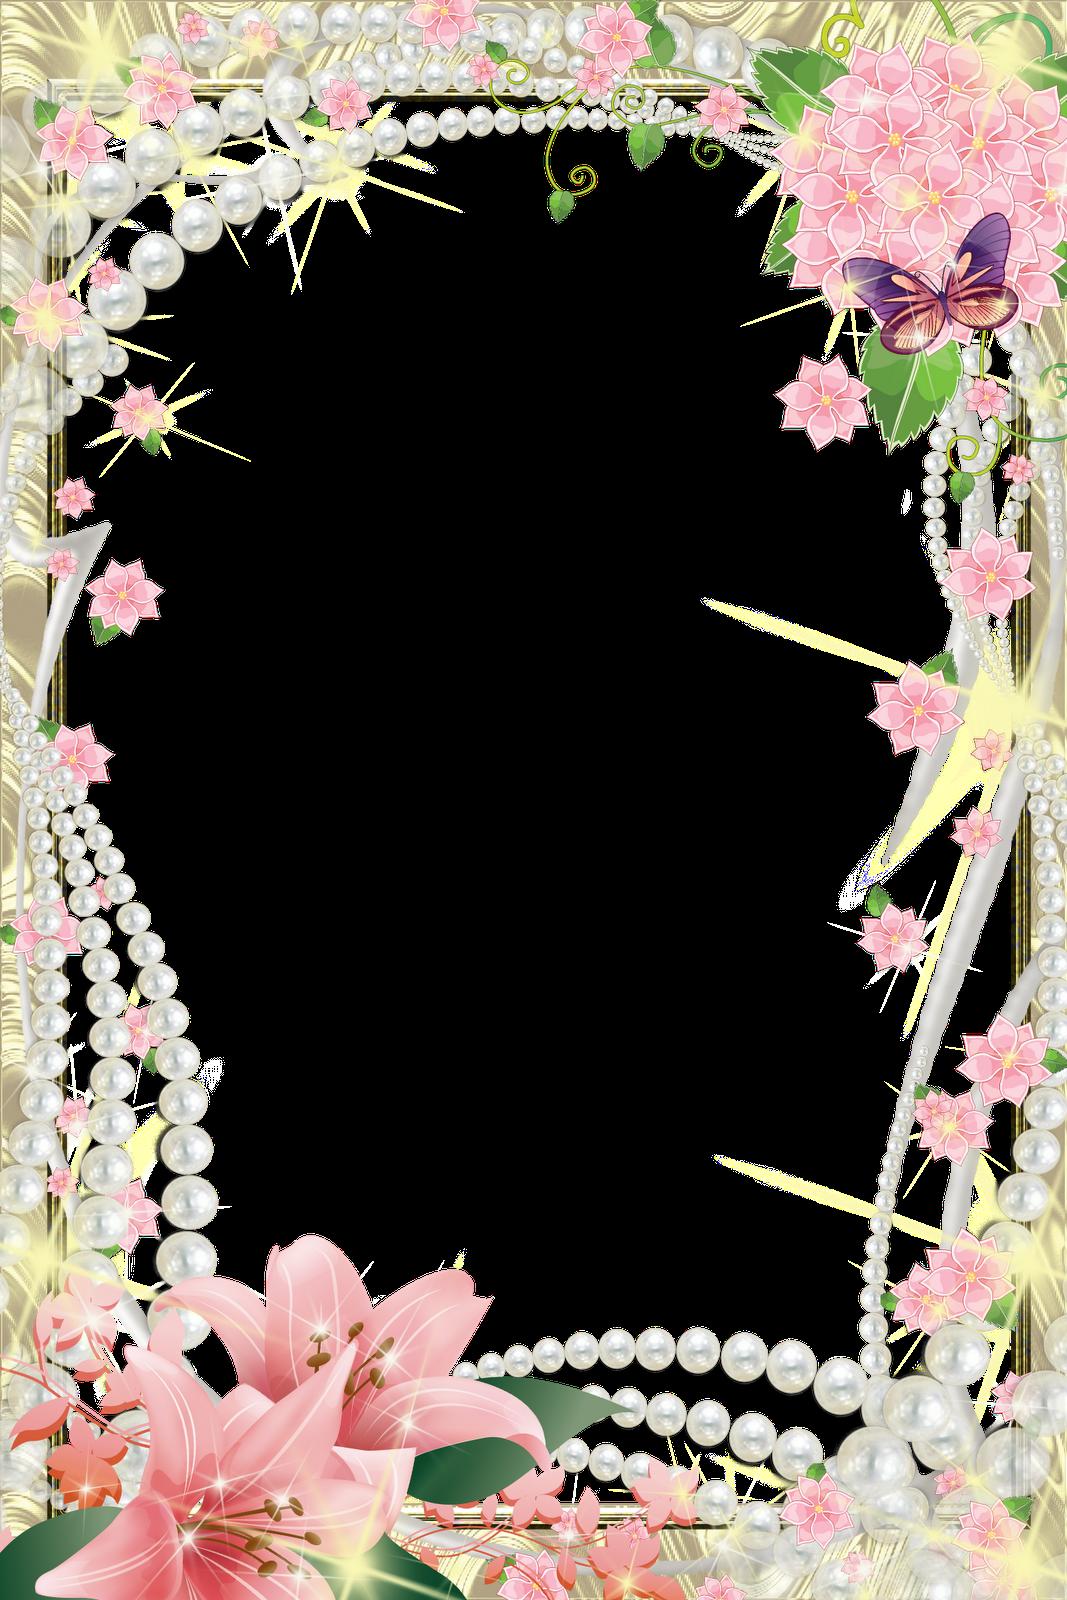 8 flores para photoshop png images border frames for - Marcos de papel para fotos ...